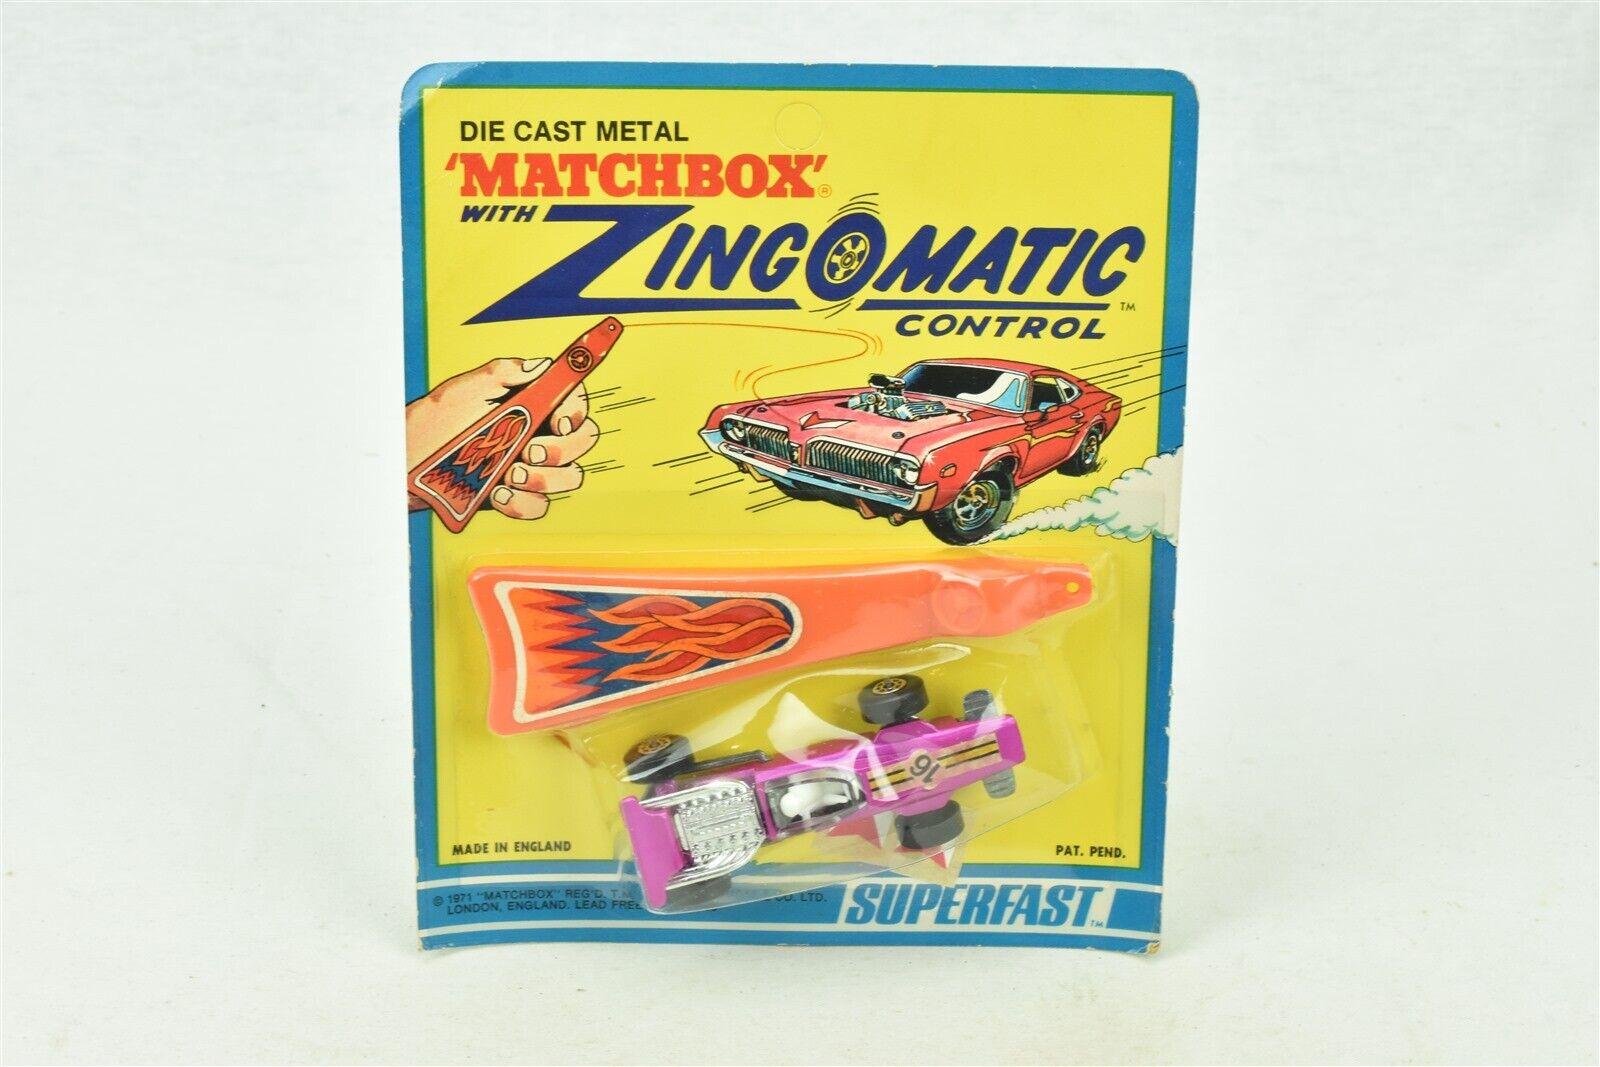 Matchbox Zingomatic Control Superfast  34 Formula Race Car unpunched card 1971